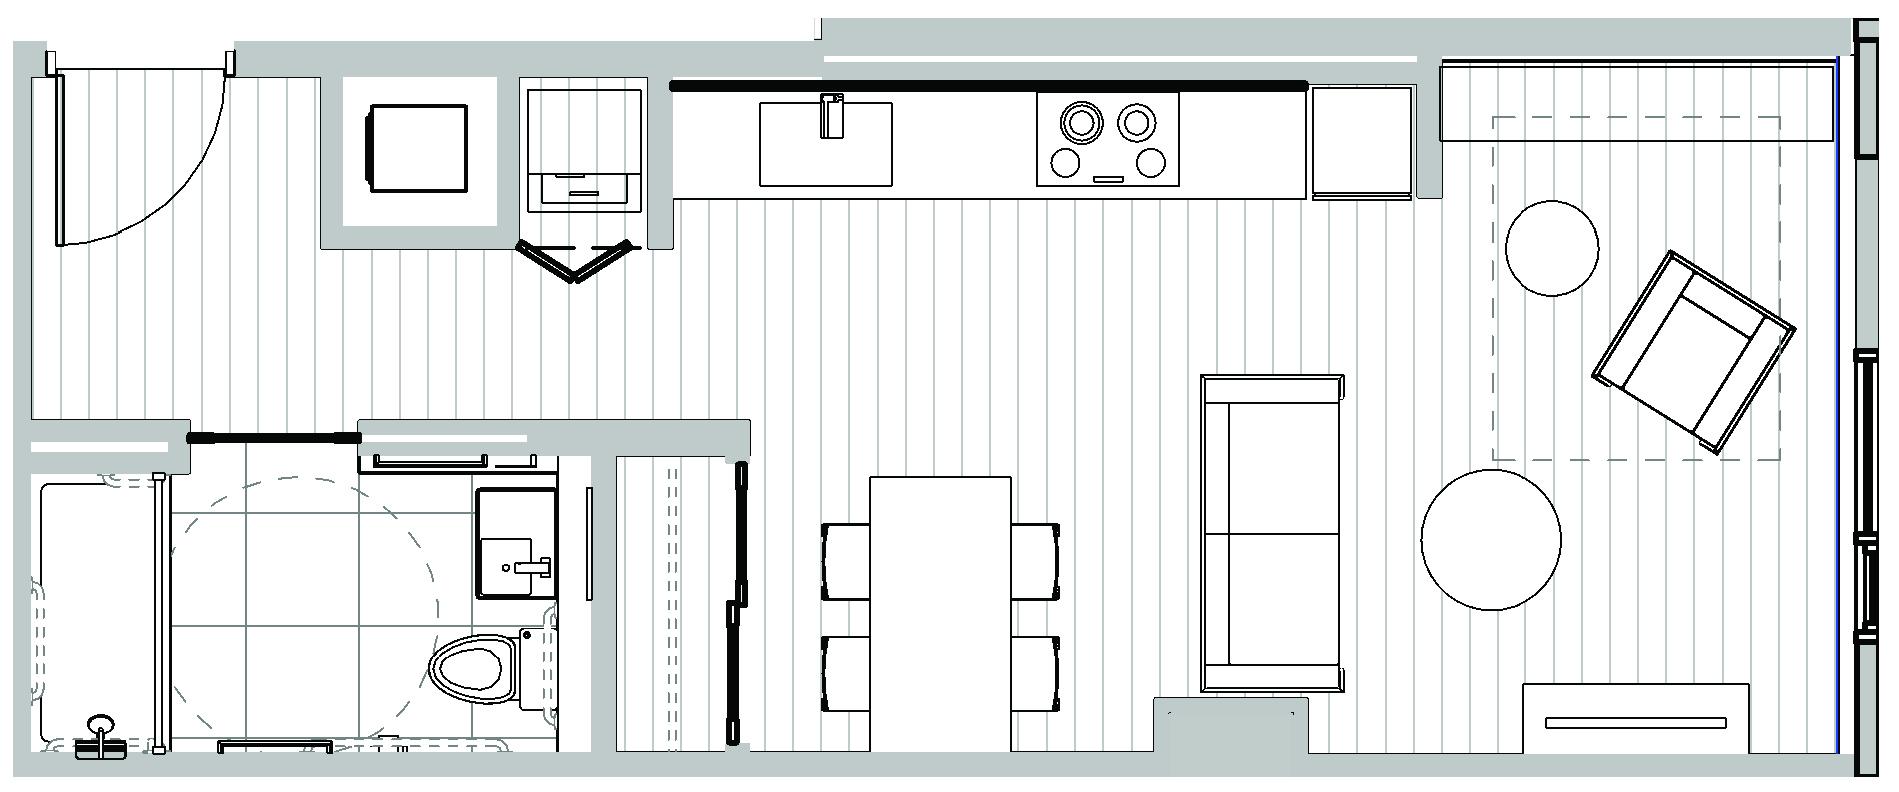 studio condos in Seattle - Koda Condominiums